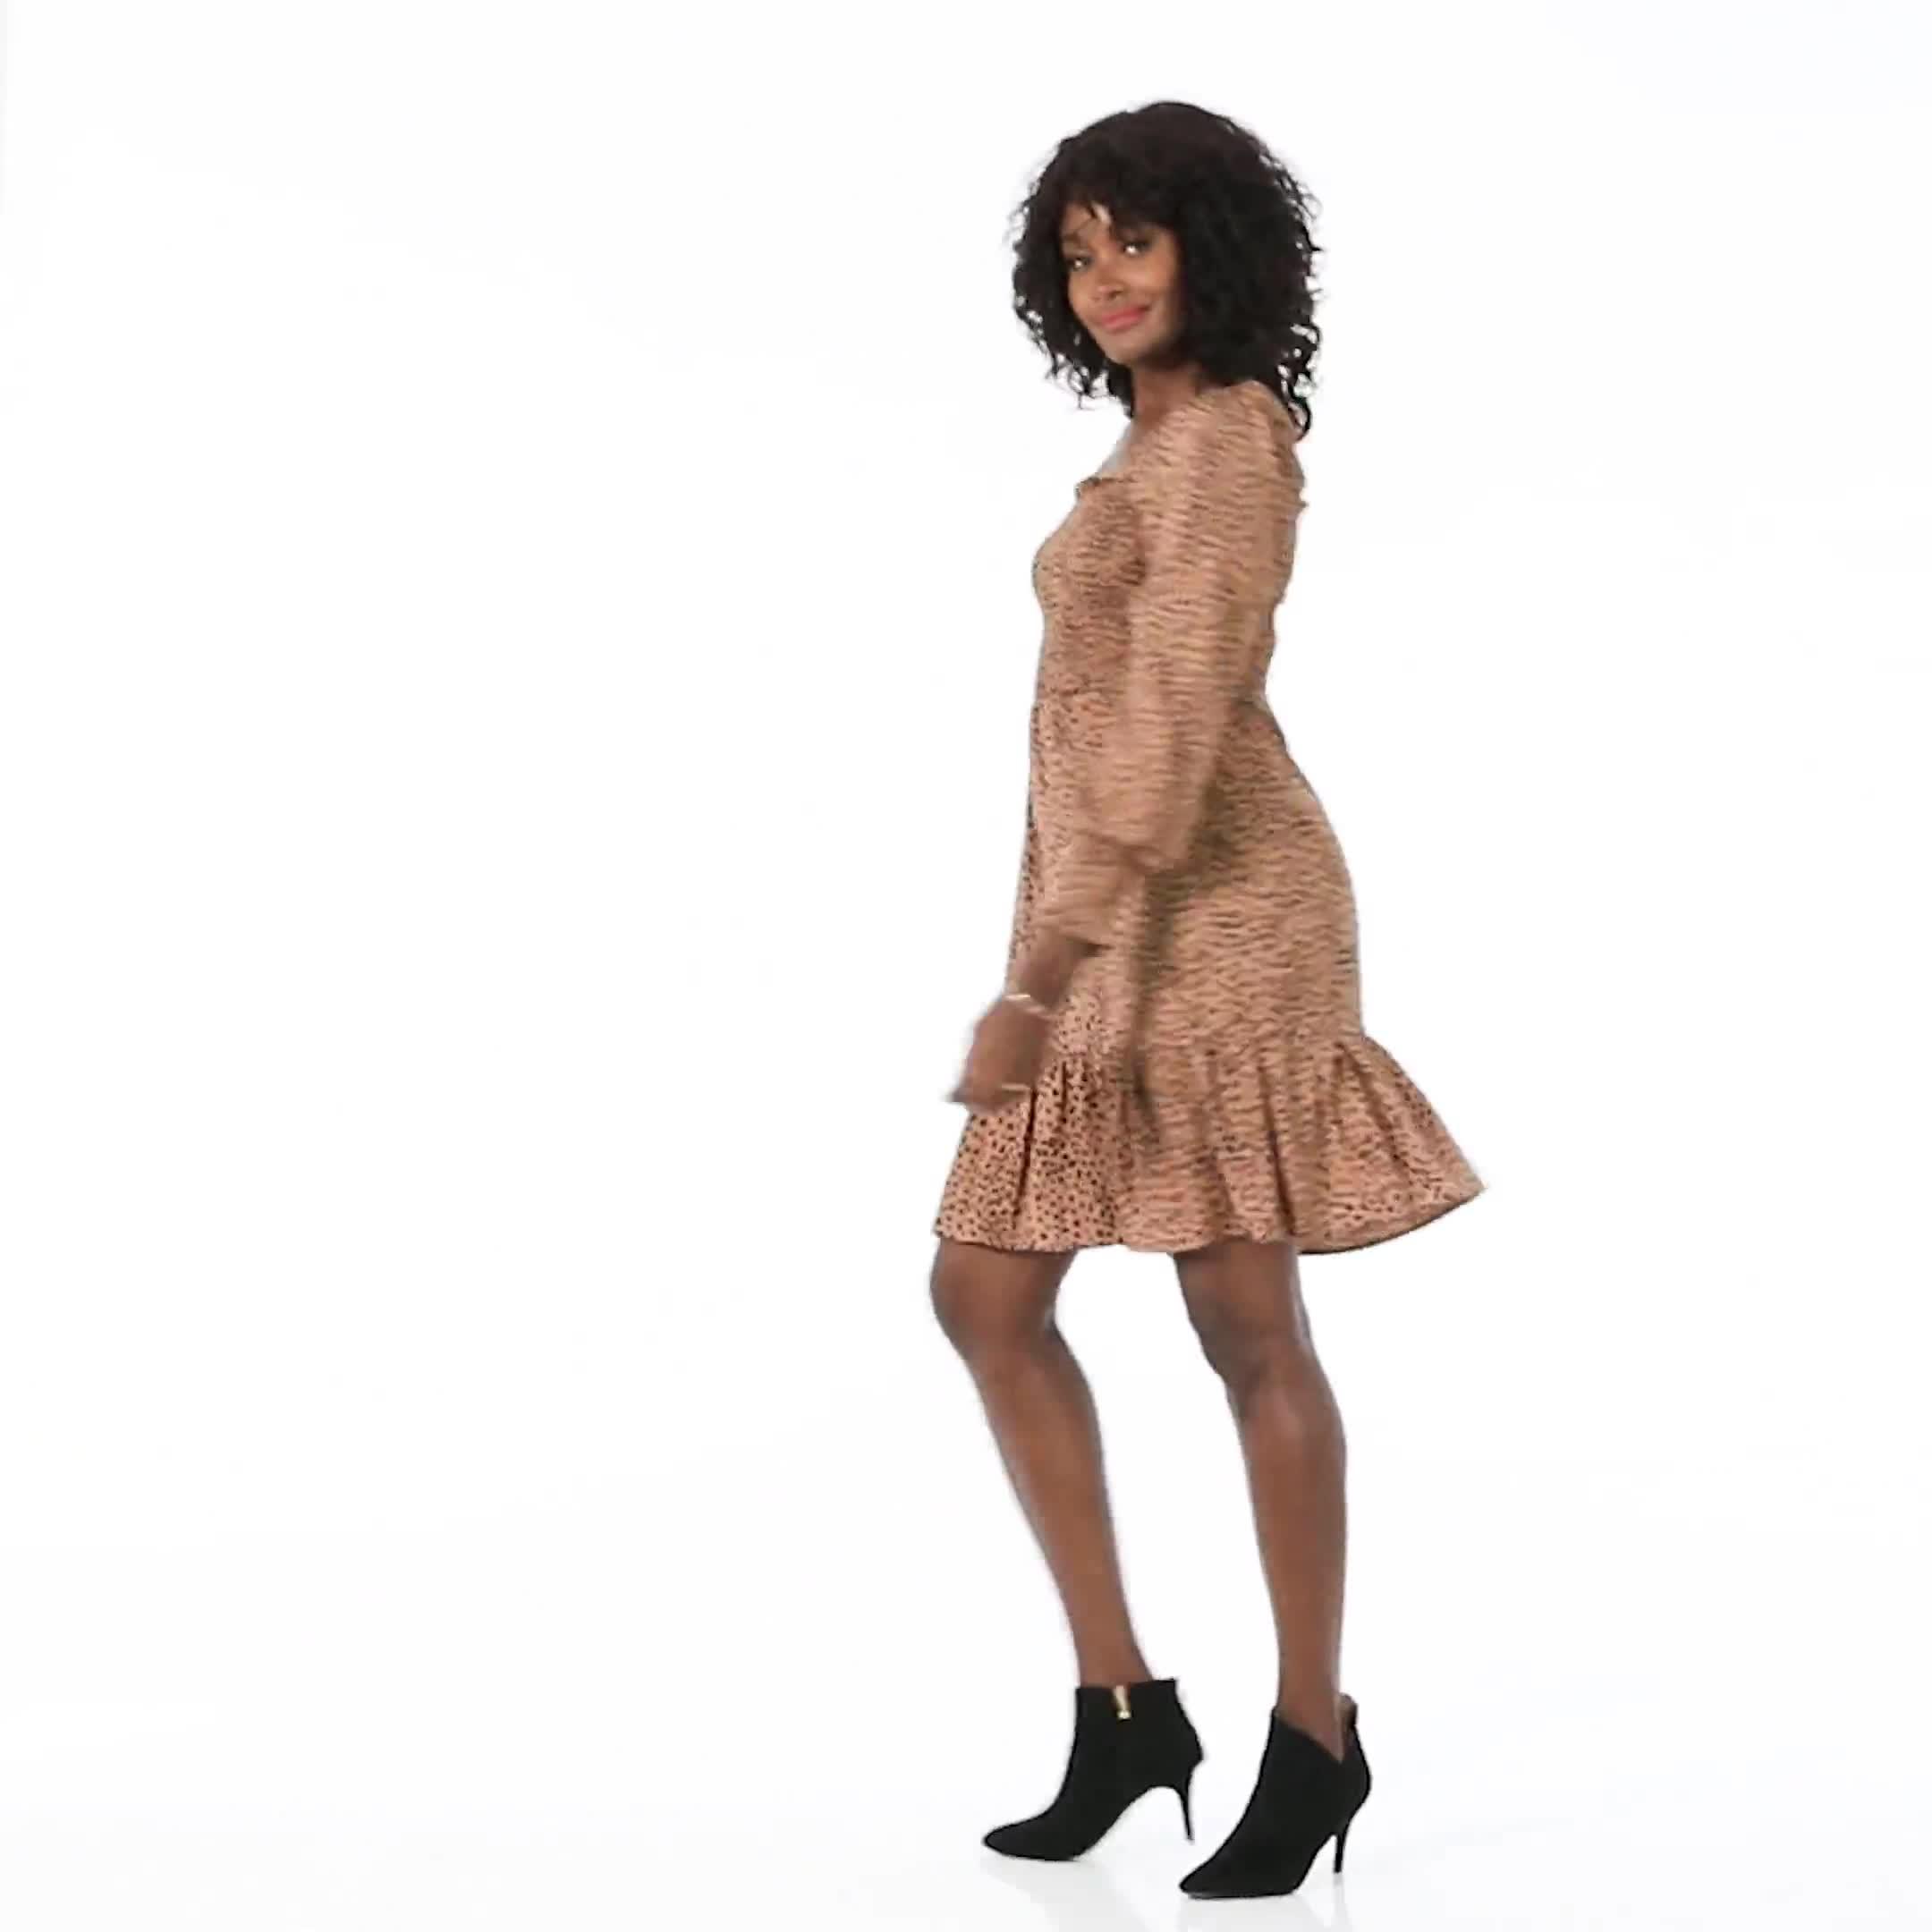 Smocked  Cheetah Dress - Misses - Video